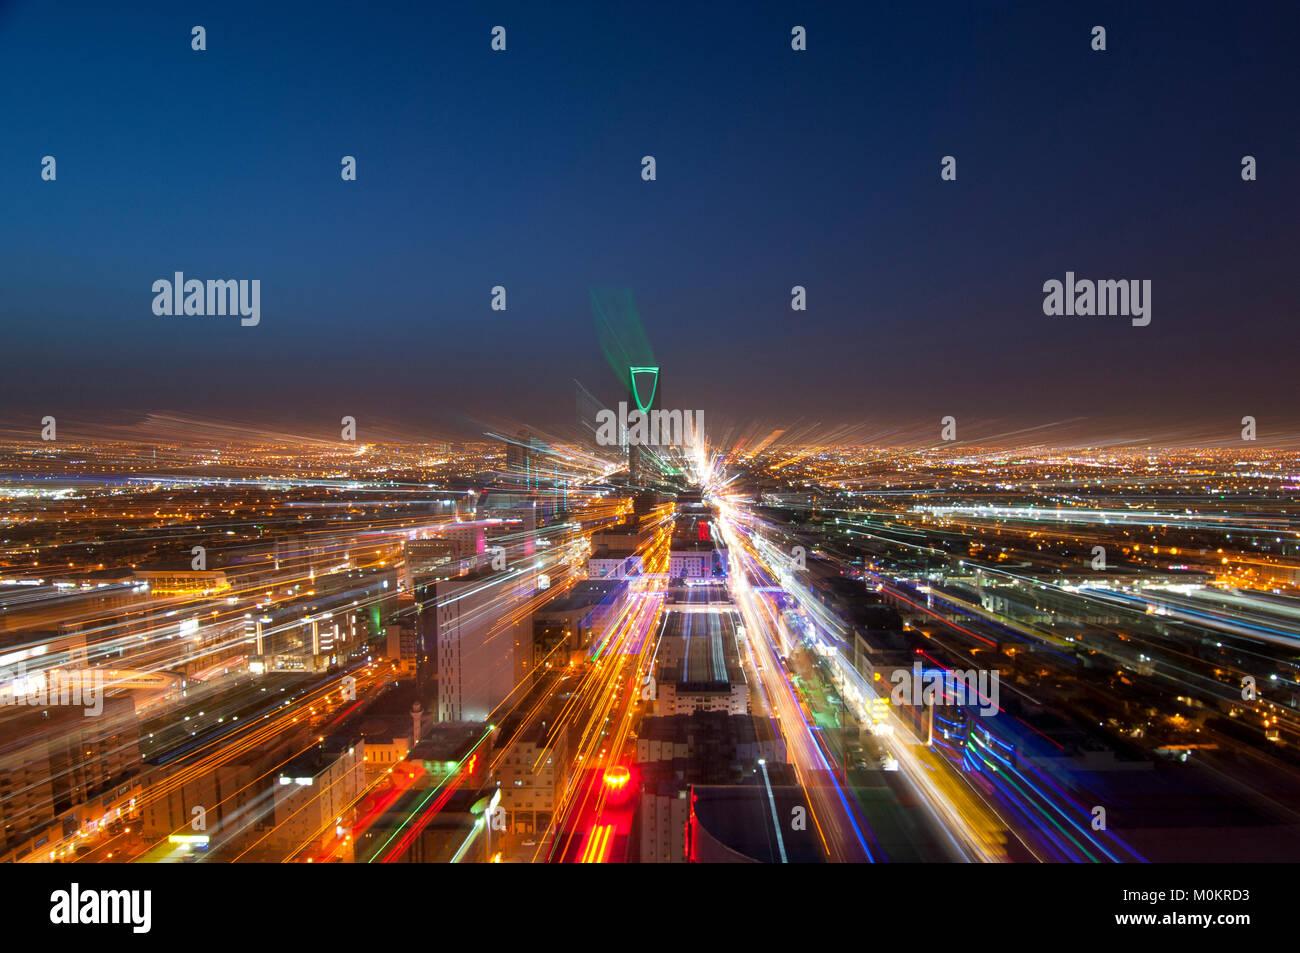 Ryad skyline en la noche #4 Imagen De Stock